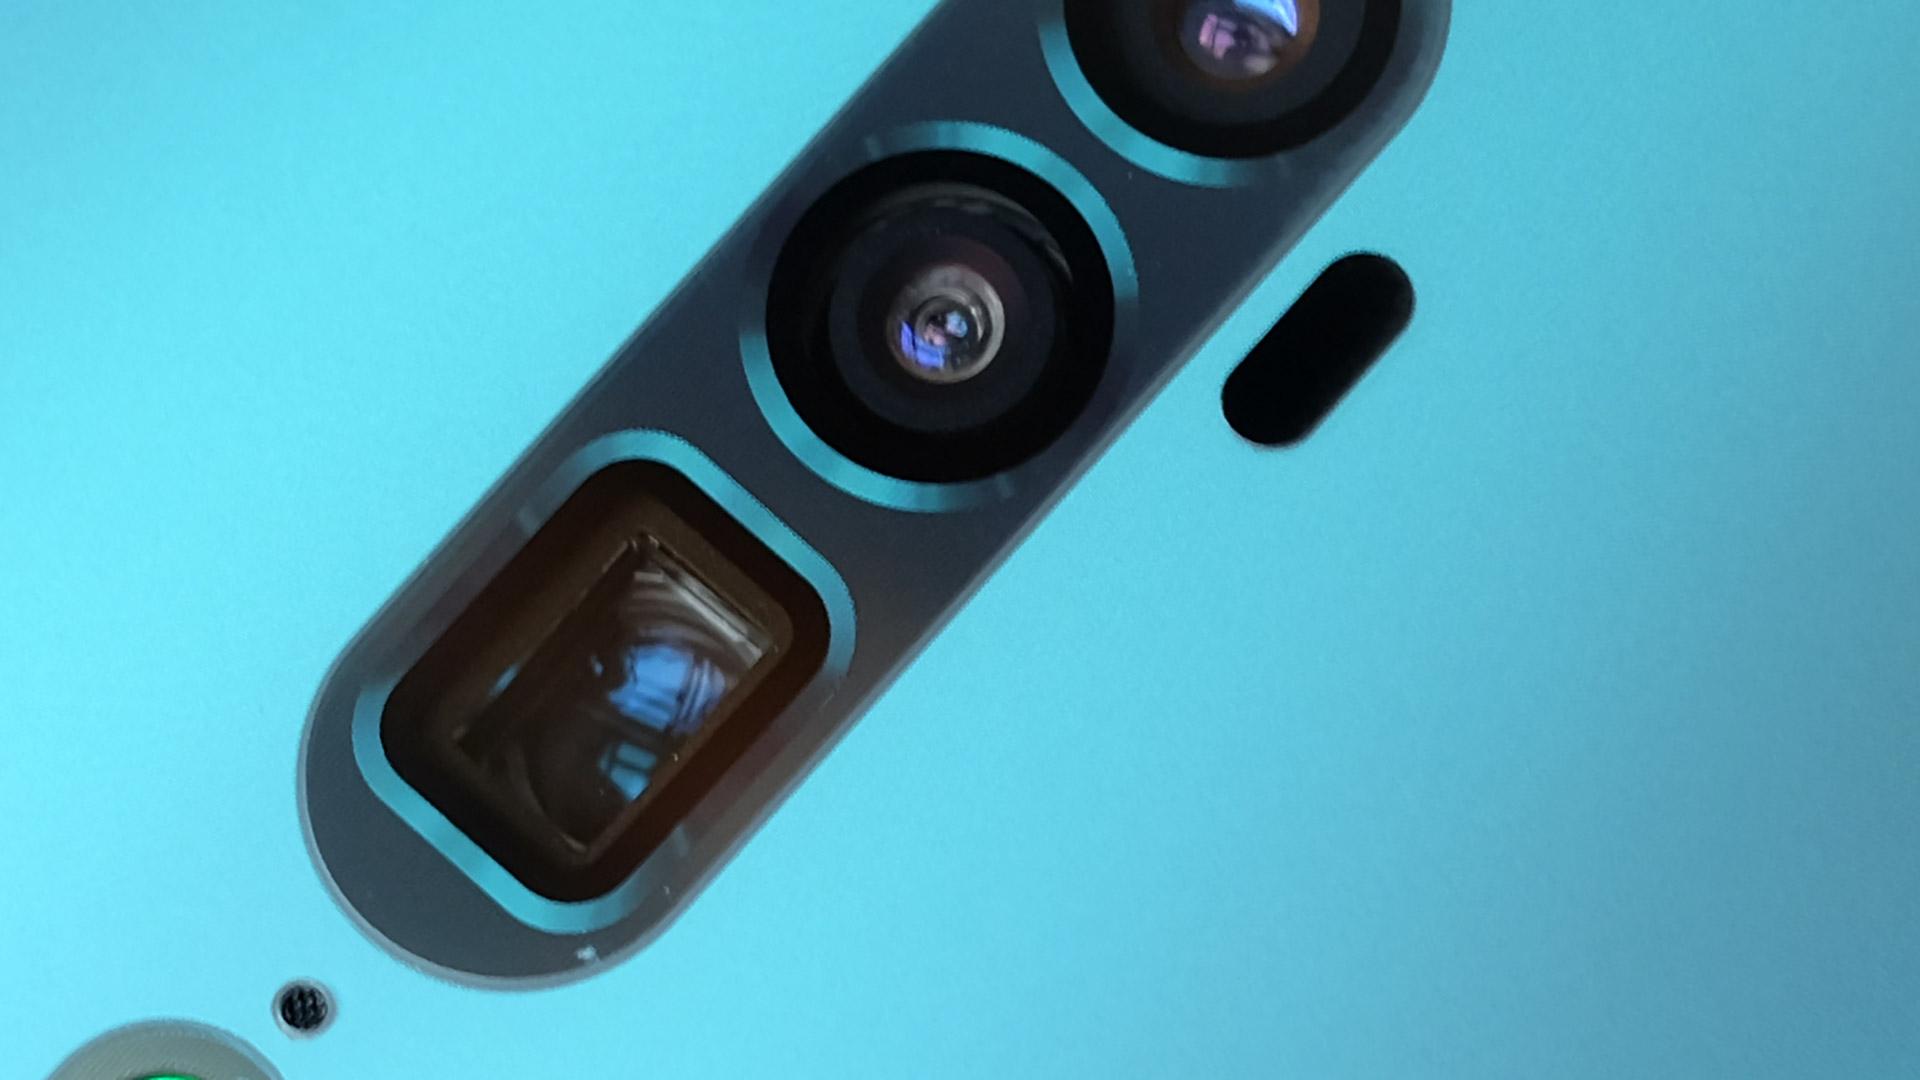 wfK3UCnAk8b7xsJsuY8QKb - Optical zoom vs digital zoom: understand your camera phone's close-up potential